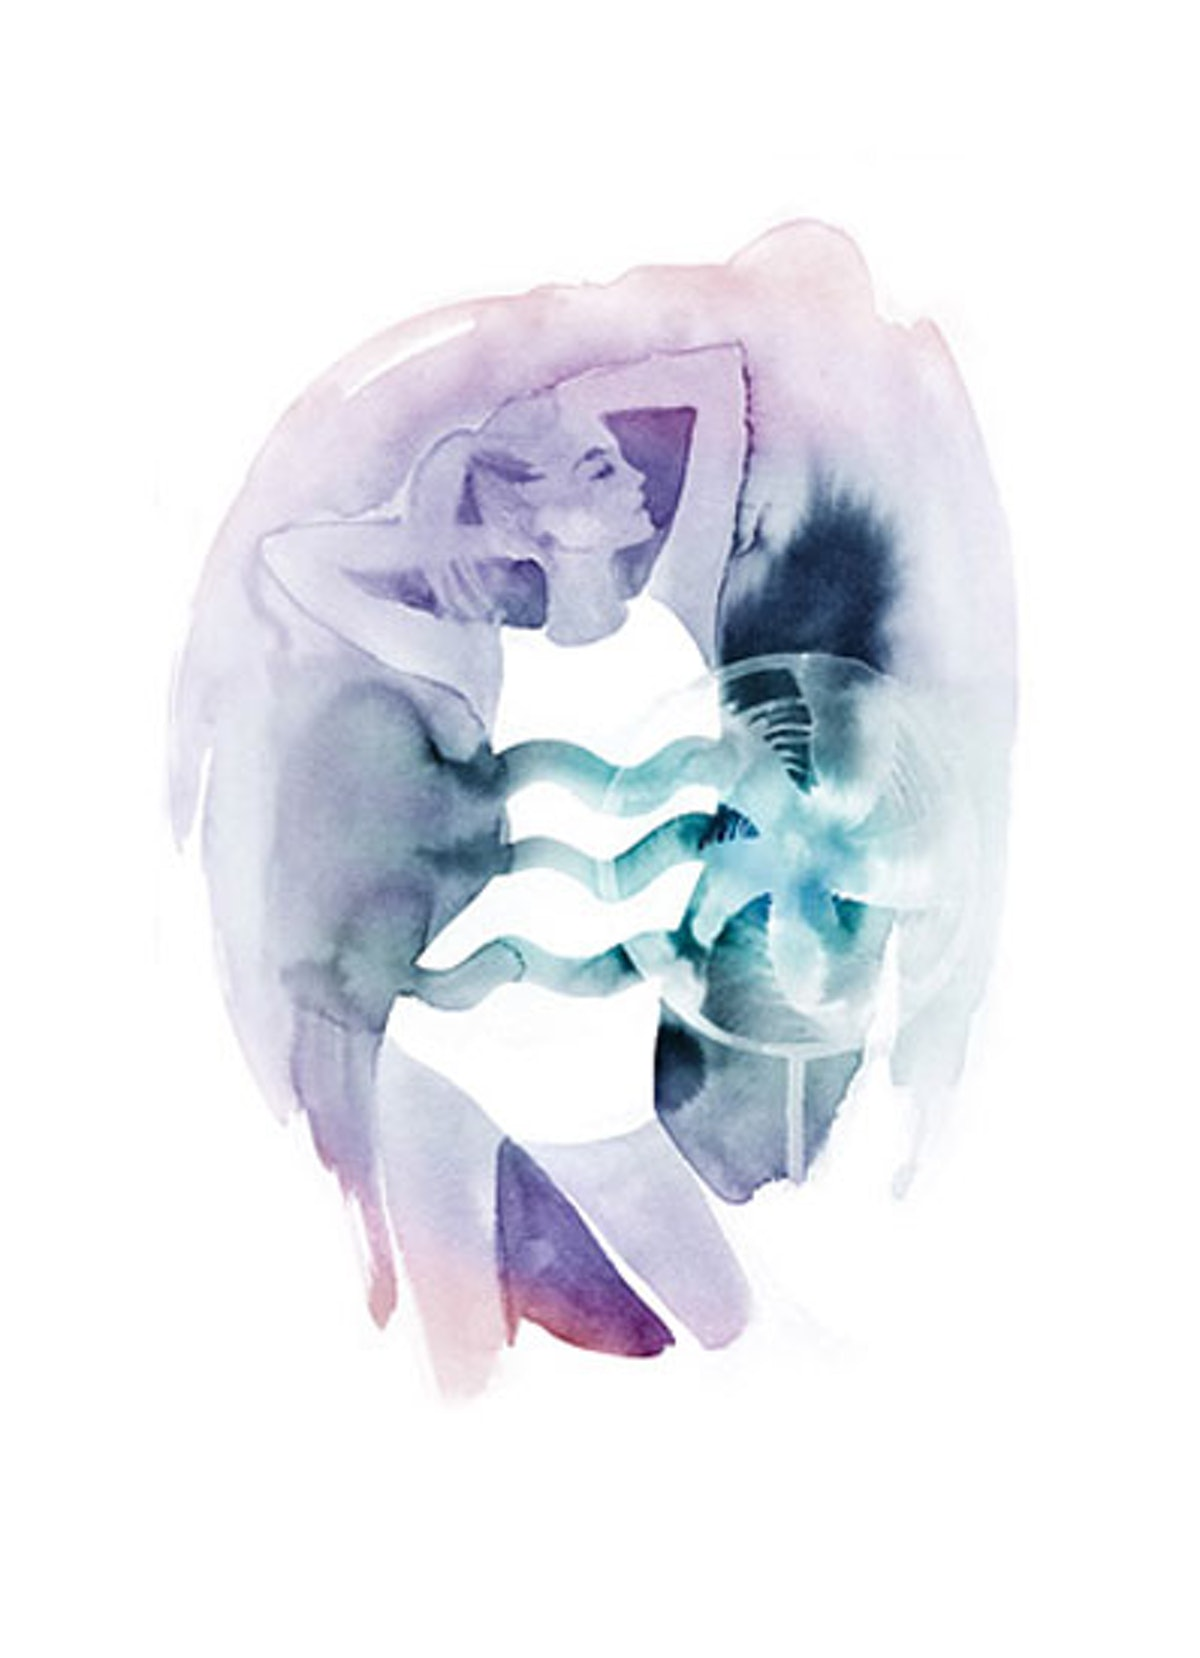 bess-janes-addiction-july-2012-01-v.jpg